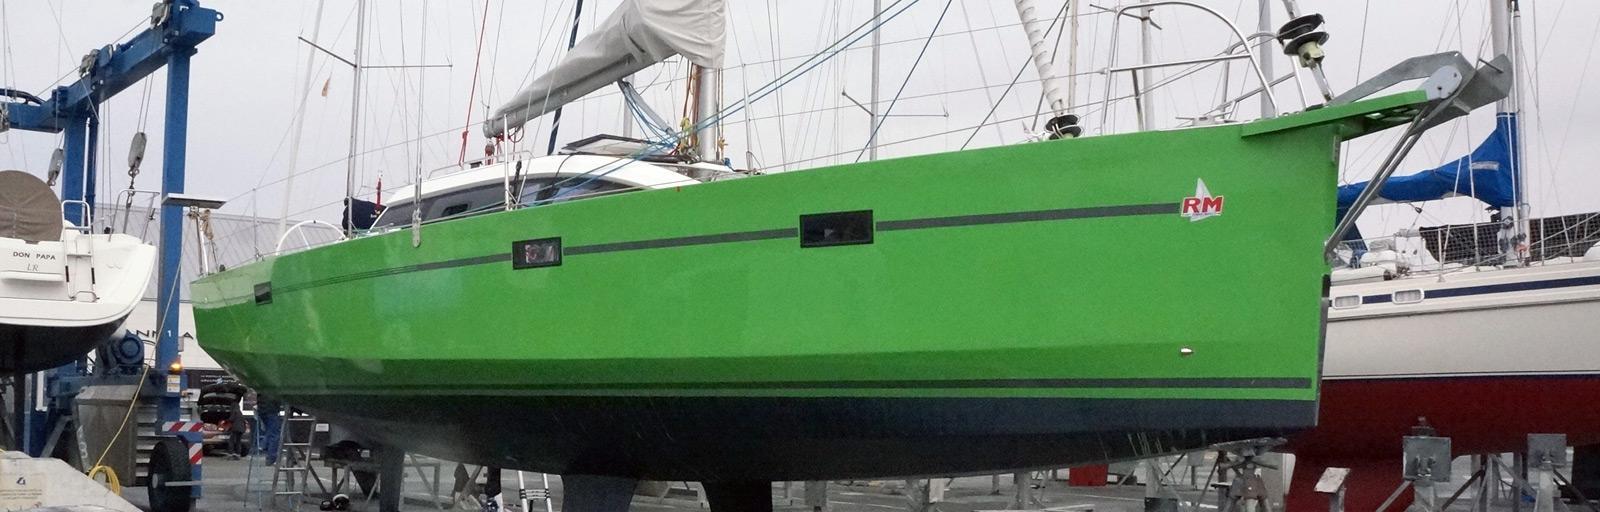 RM 1060 - AYC Yachtbroker